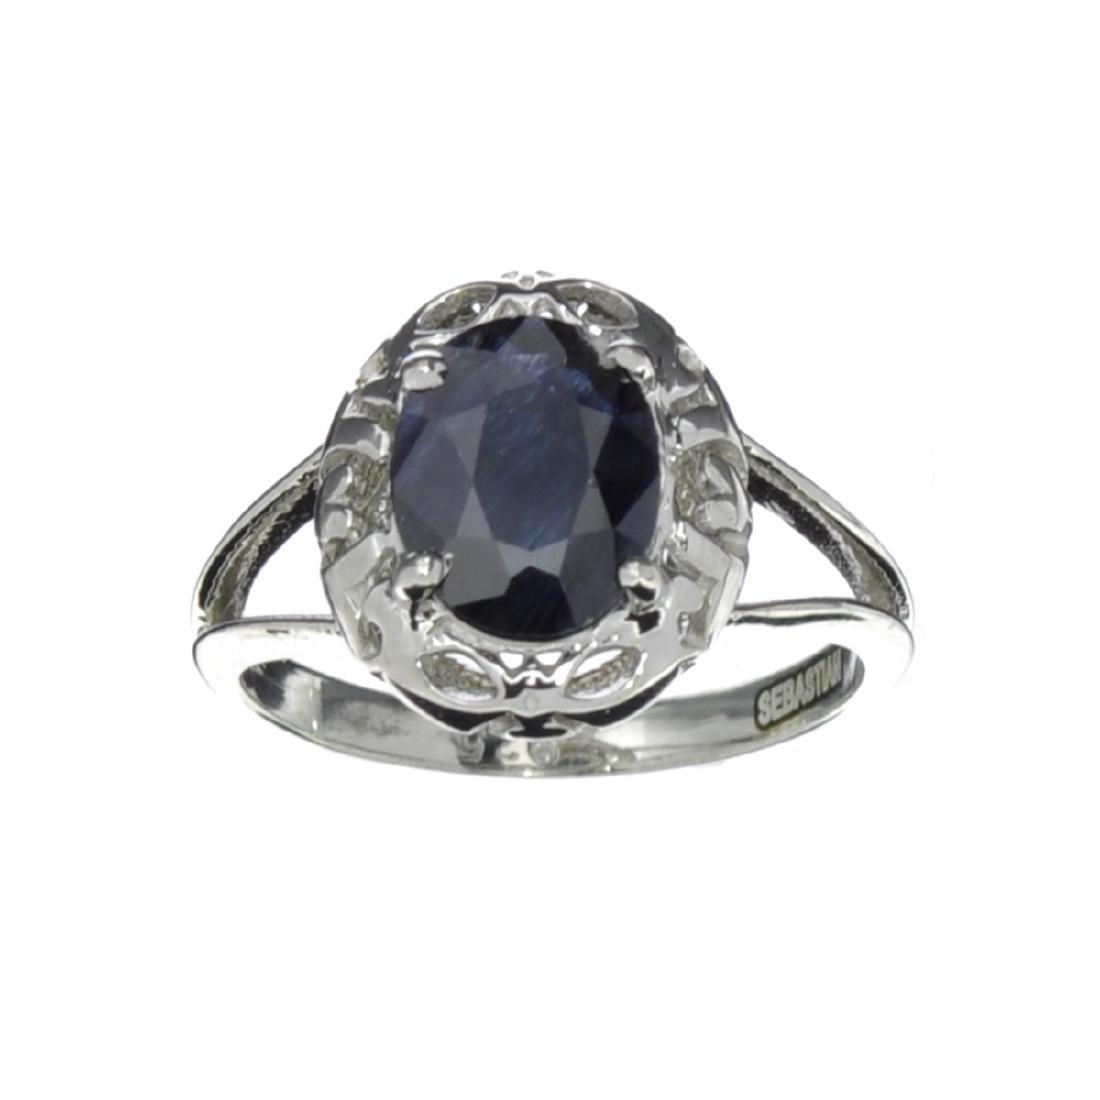 APP: 0.6k Fine Jewelry Designer Sebastian, 2.35CT Oval